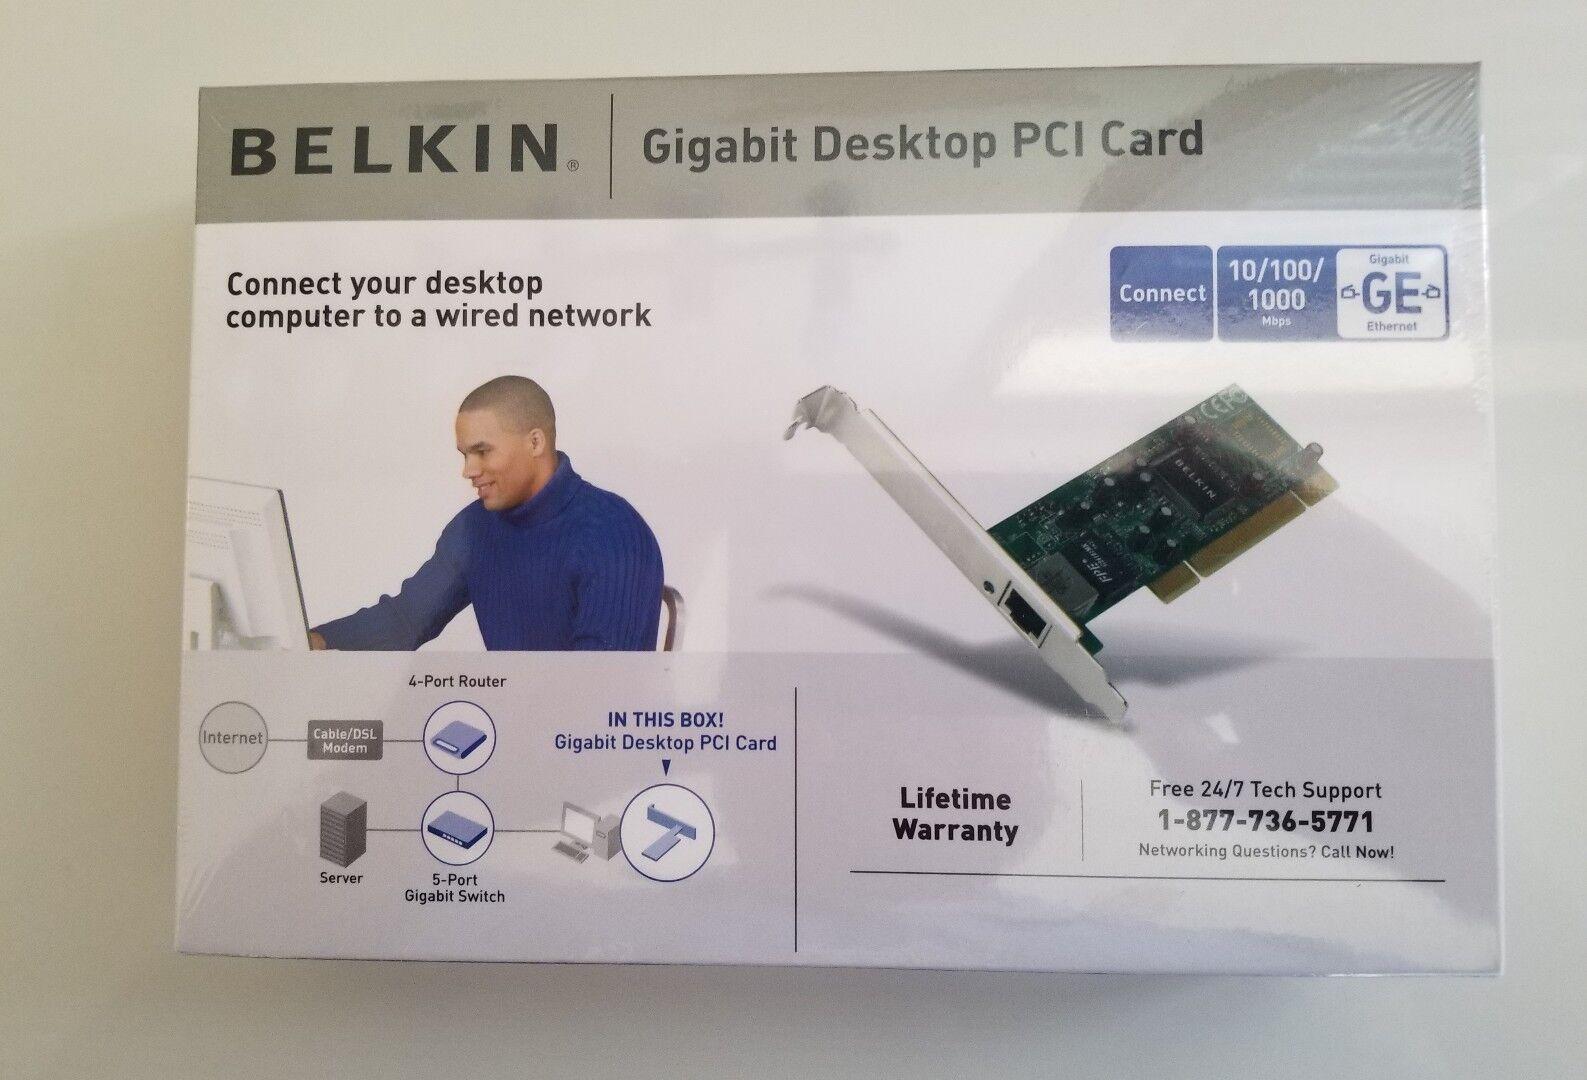 BELKIN F5D5005 DRIVER FOR PC